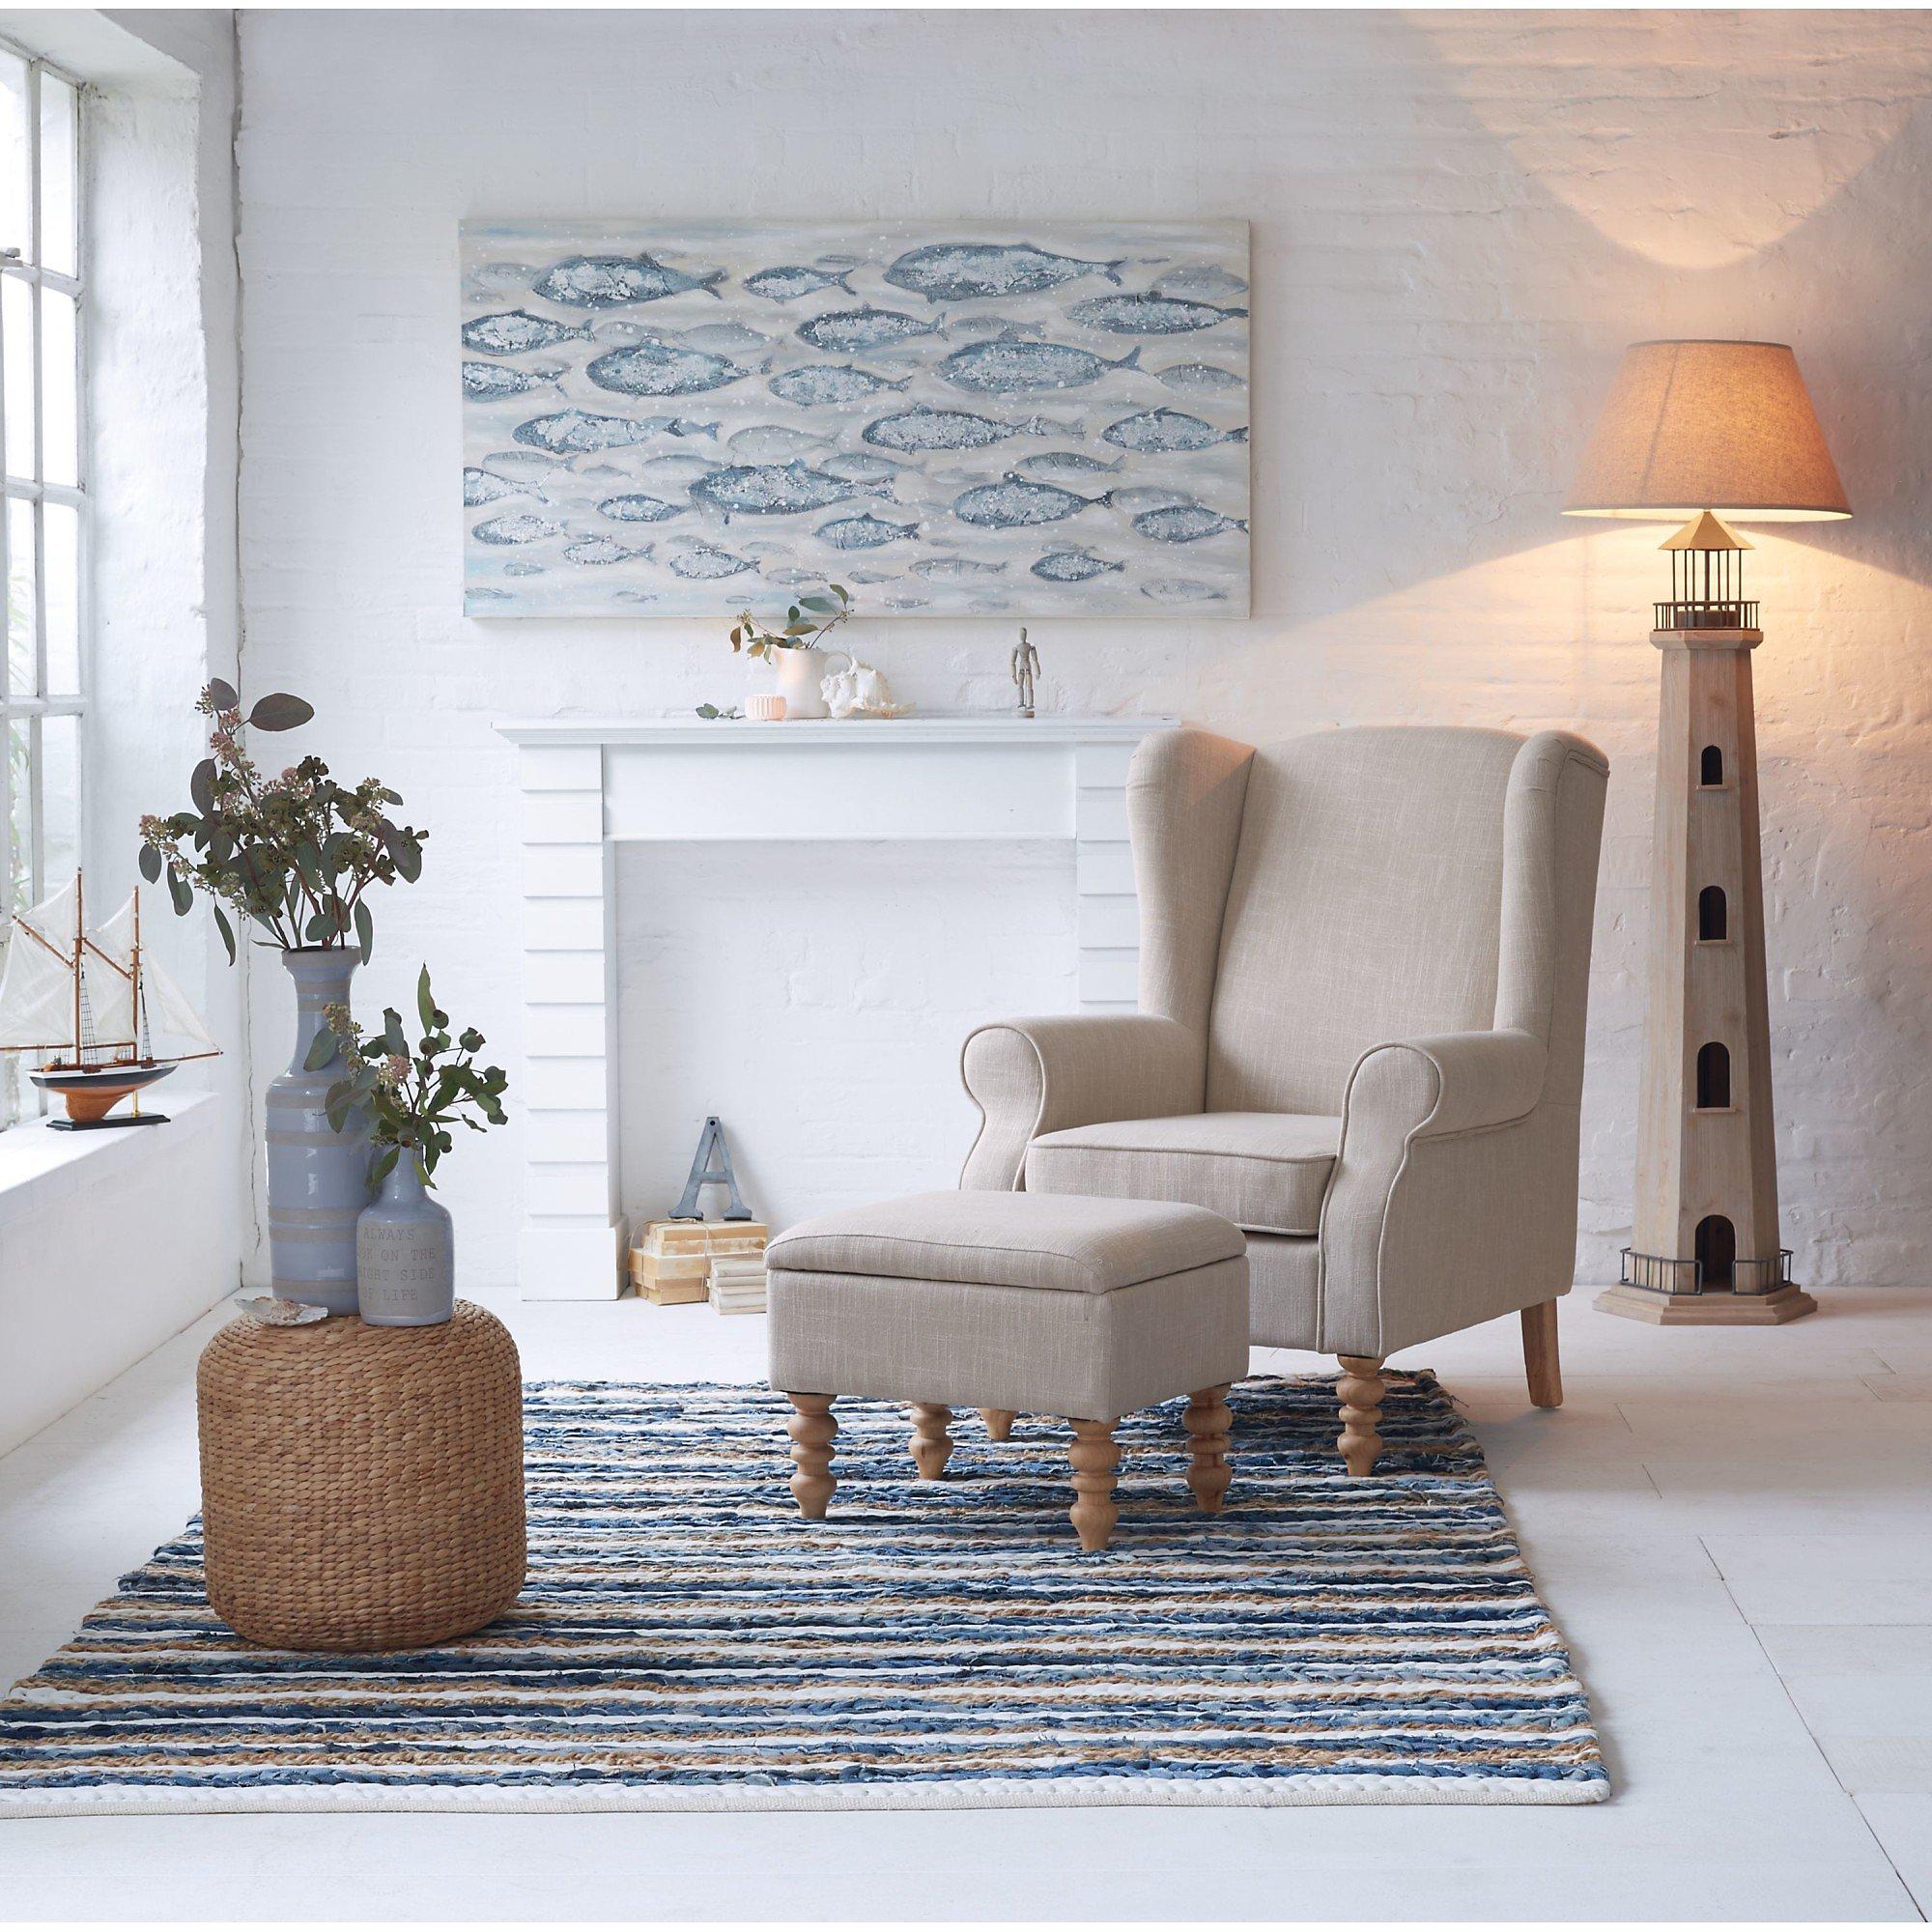 Wandbilder grau weiss elegant wandbilder grau turkis for Wohnzimmer deko grau turkis